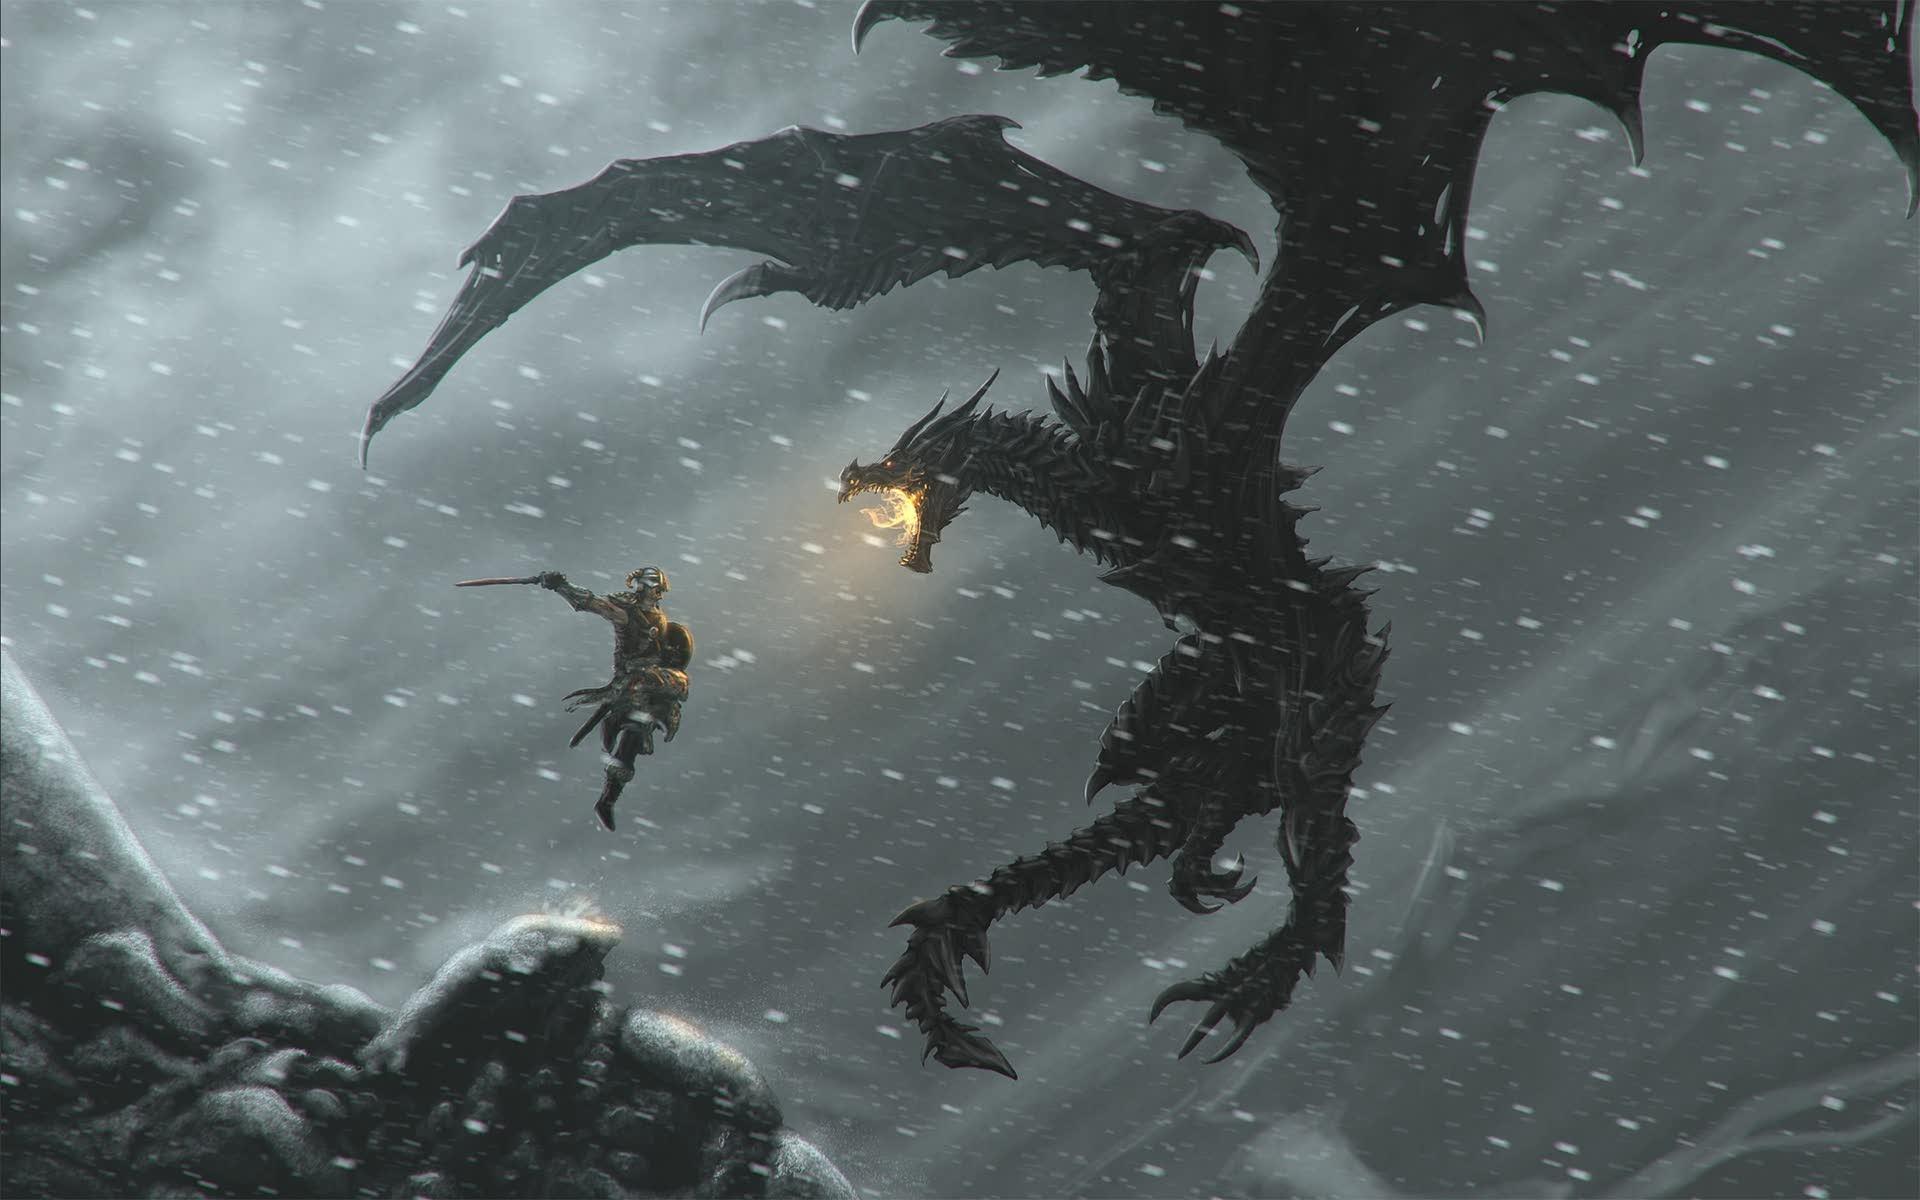 General 1920x1200 The Elder Scrolls V: Skyrim video games Alduin The Elder Scrolls V: Skyrim dragon dovahkiin dragonborn